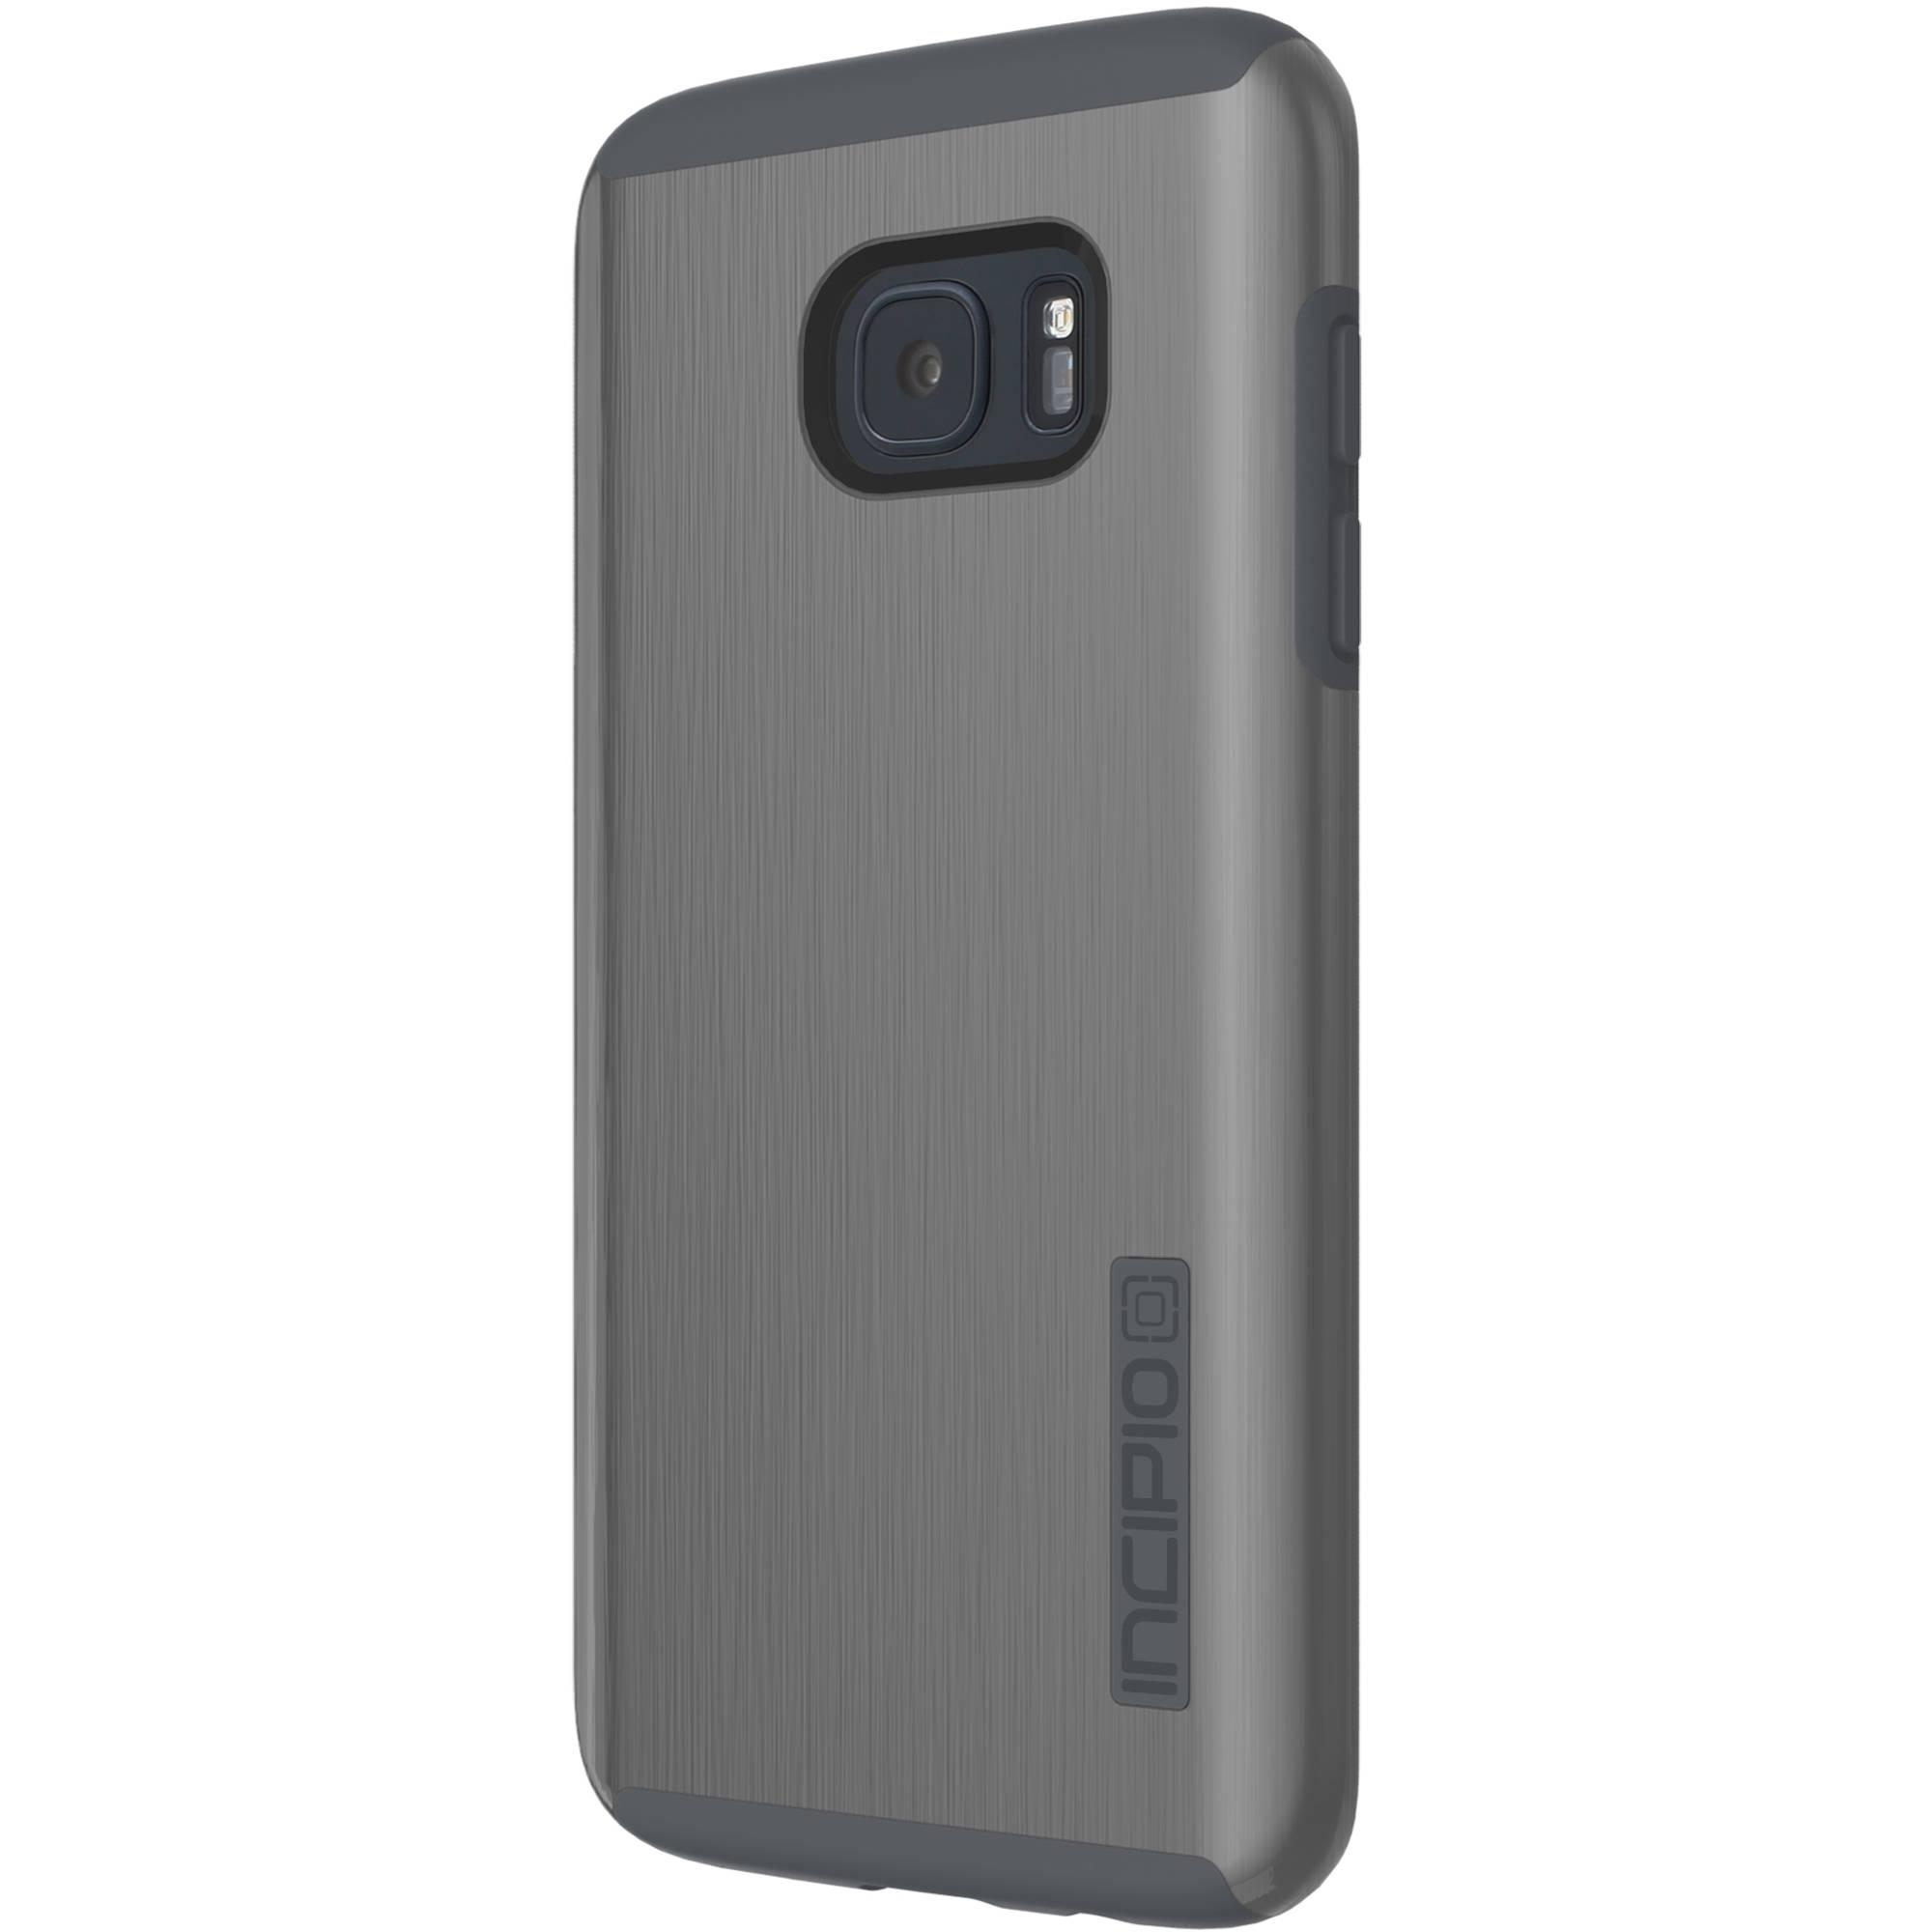 best sneakers 1b5c9 d3b0a Incipio DualPro SHINE Case for Galaxy S7 edge (Gunmetal/Gray)